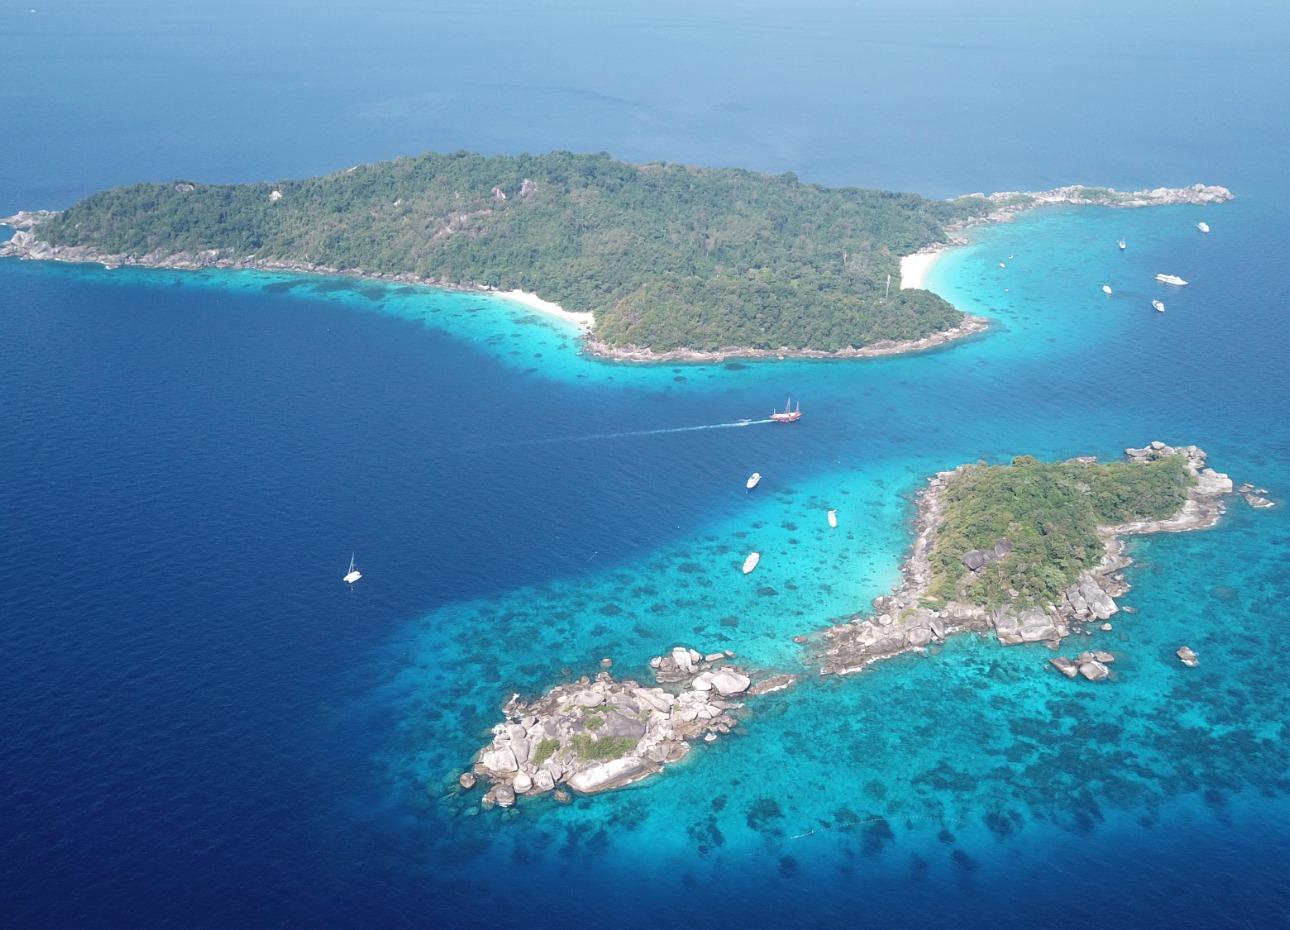 Aerial view of Thai islands